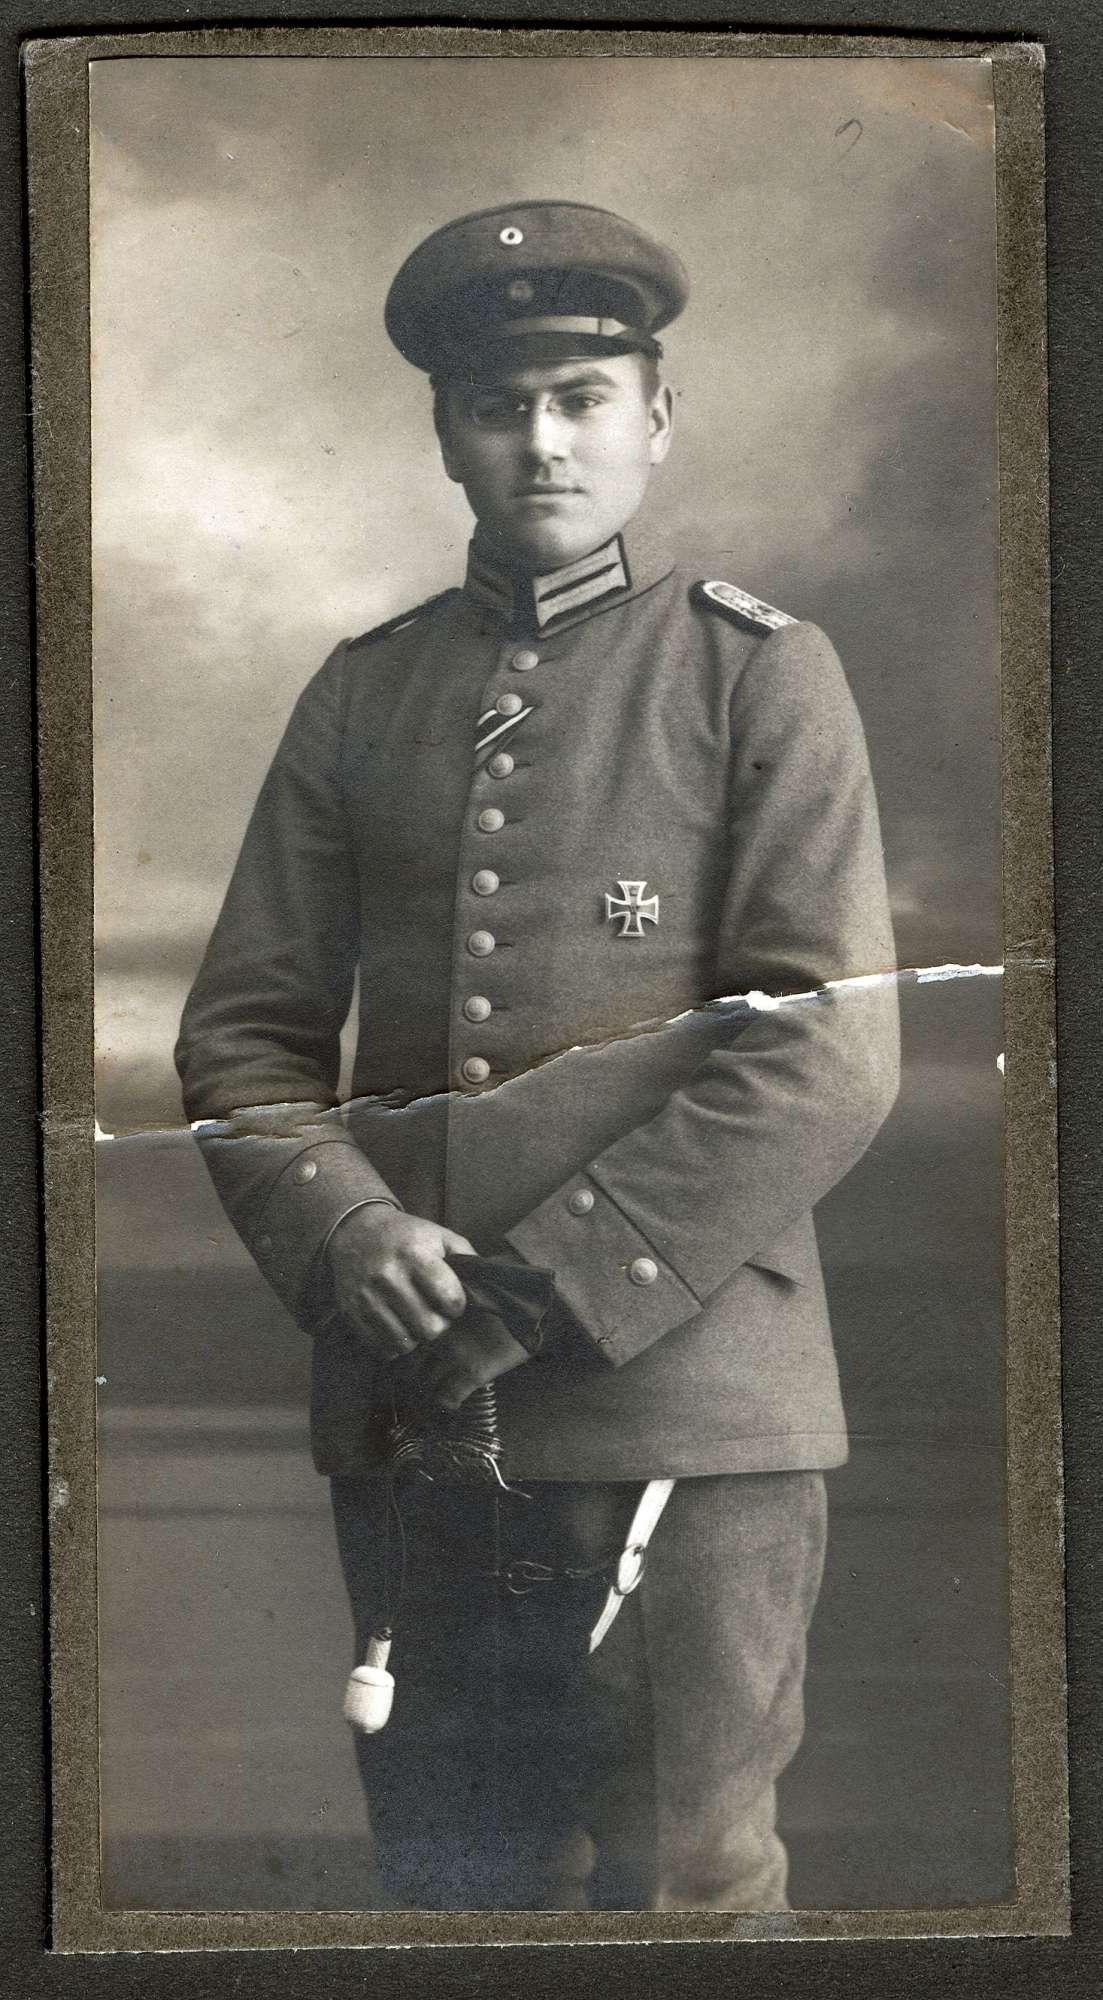 Kräutle, Karl, Dr., Bild 1